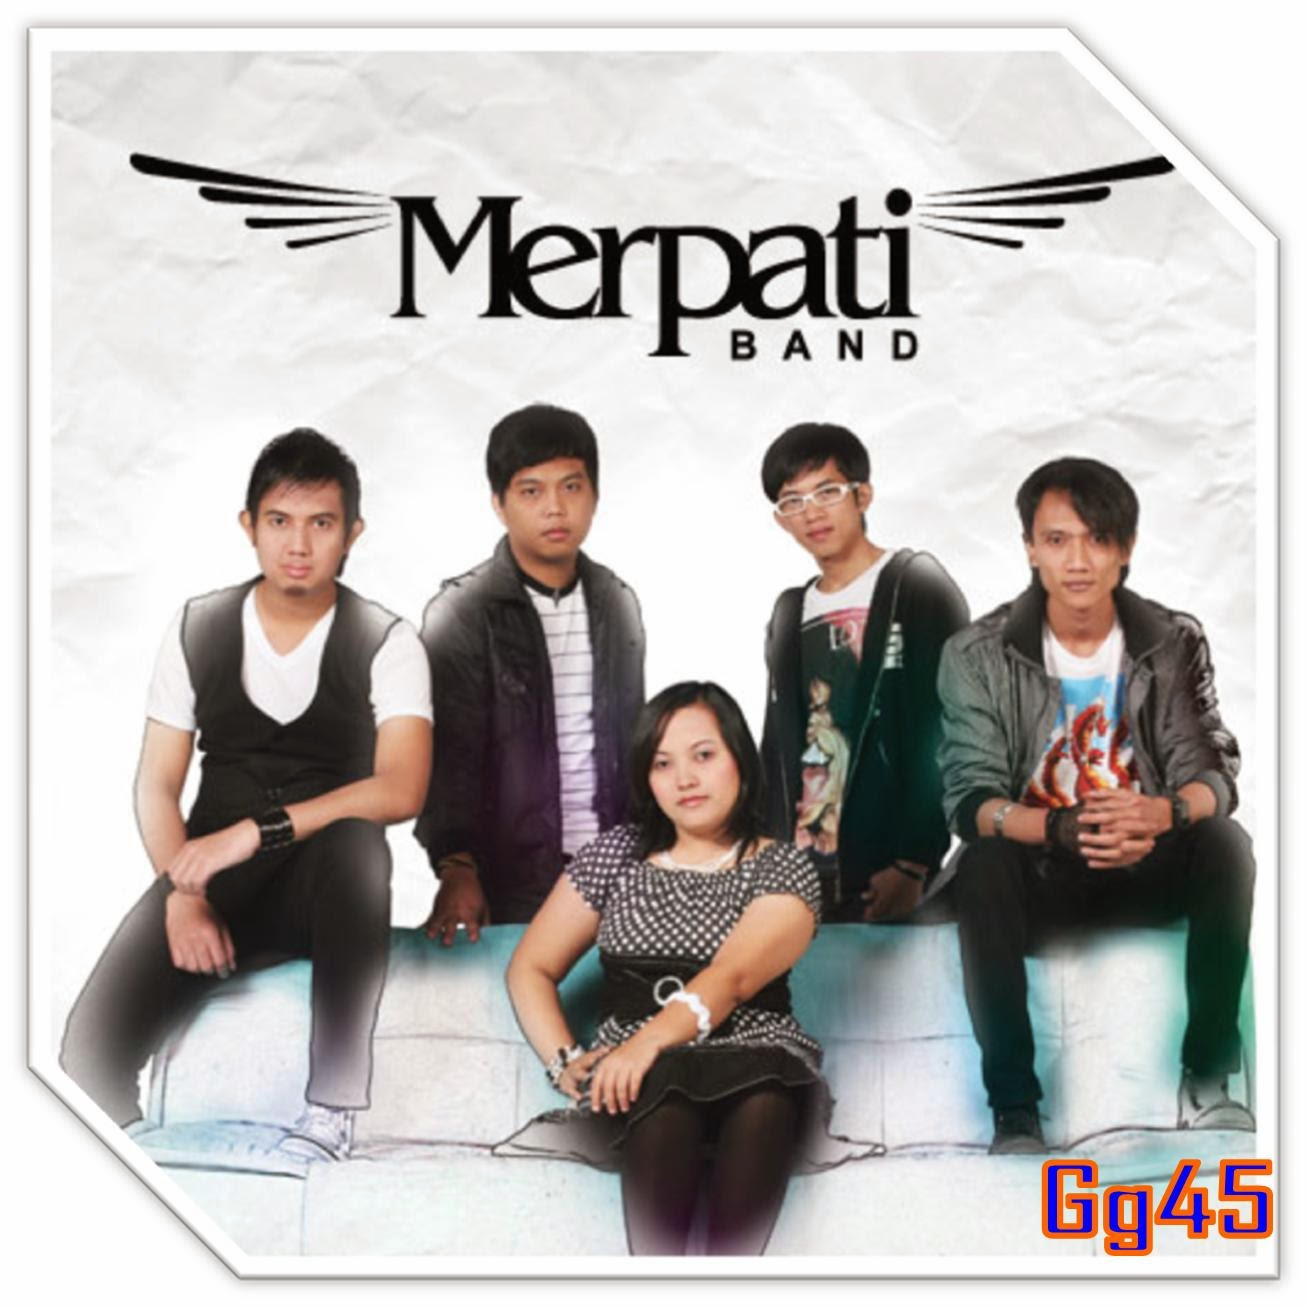 Dawload Lagu Mp3 Tamvan: Download Kumpulan Mp3 Lagu Merpati Band Lengkap